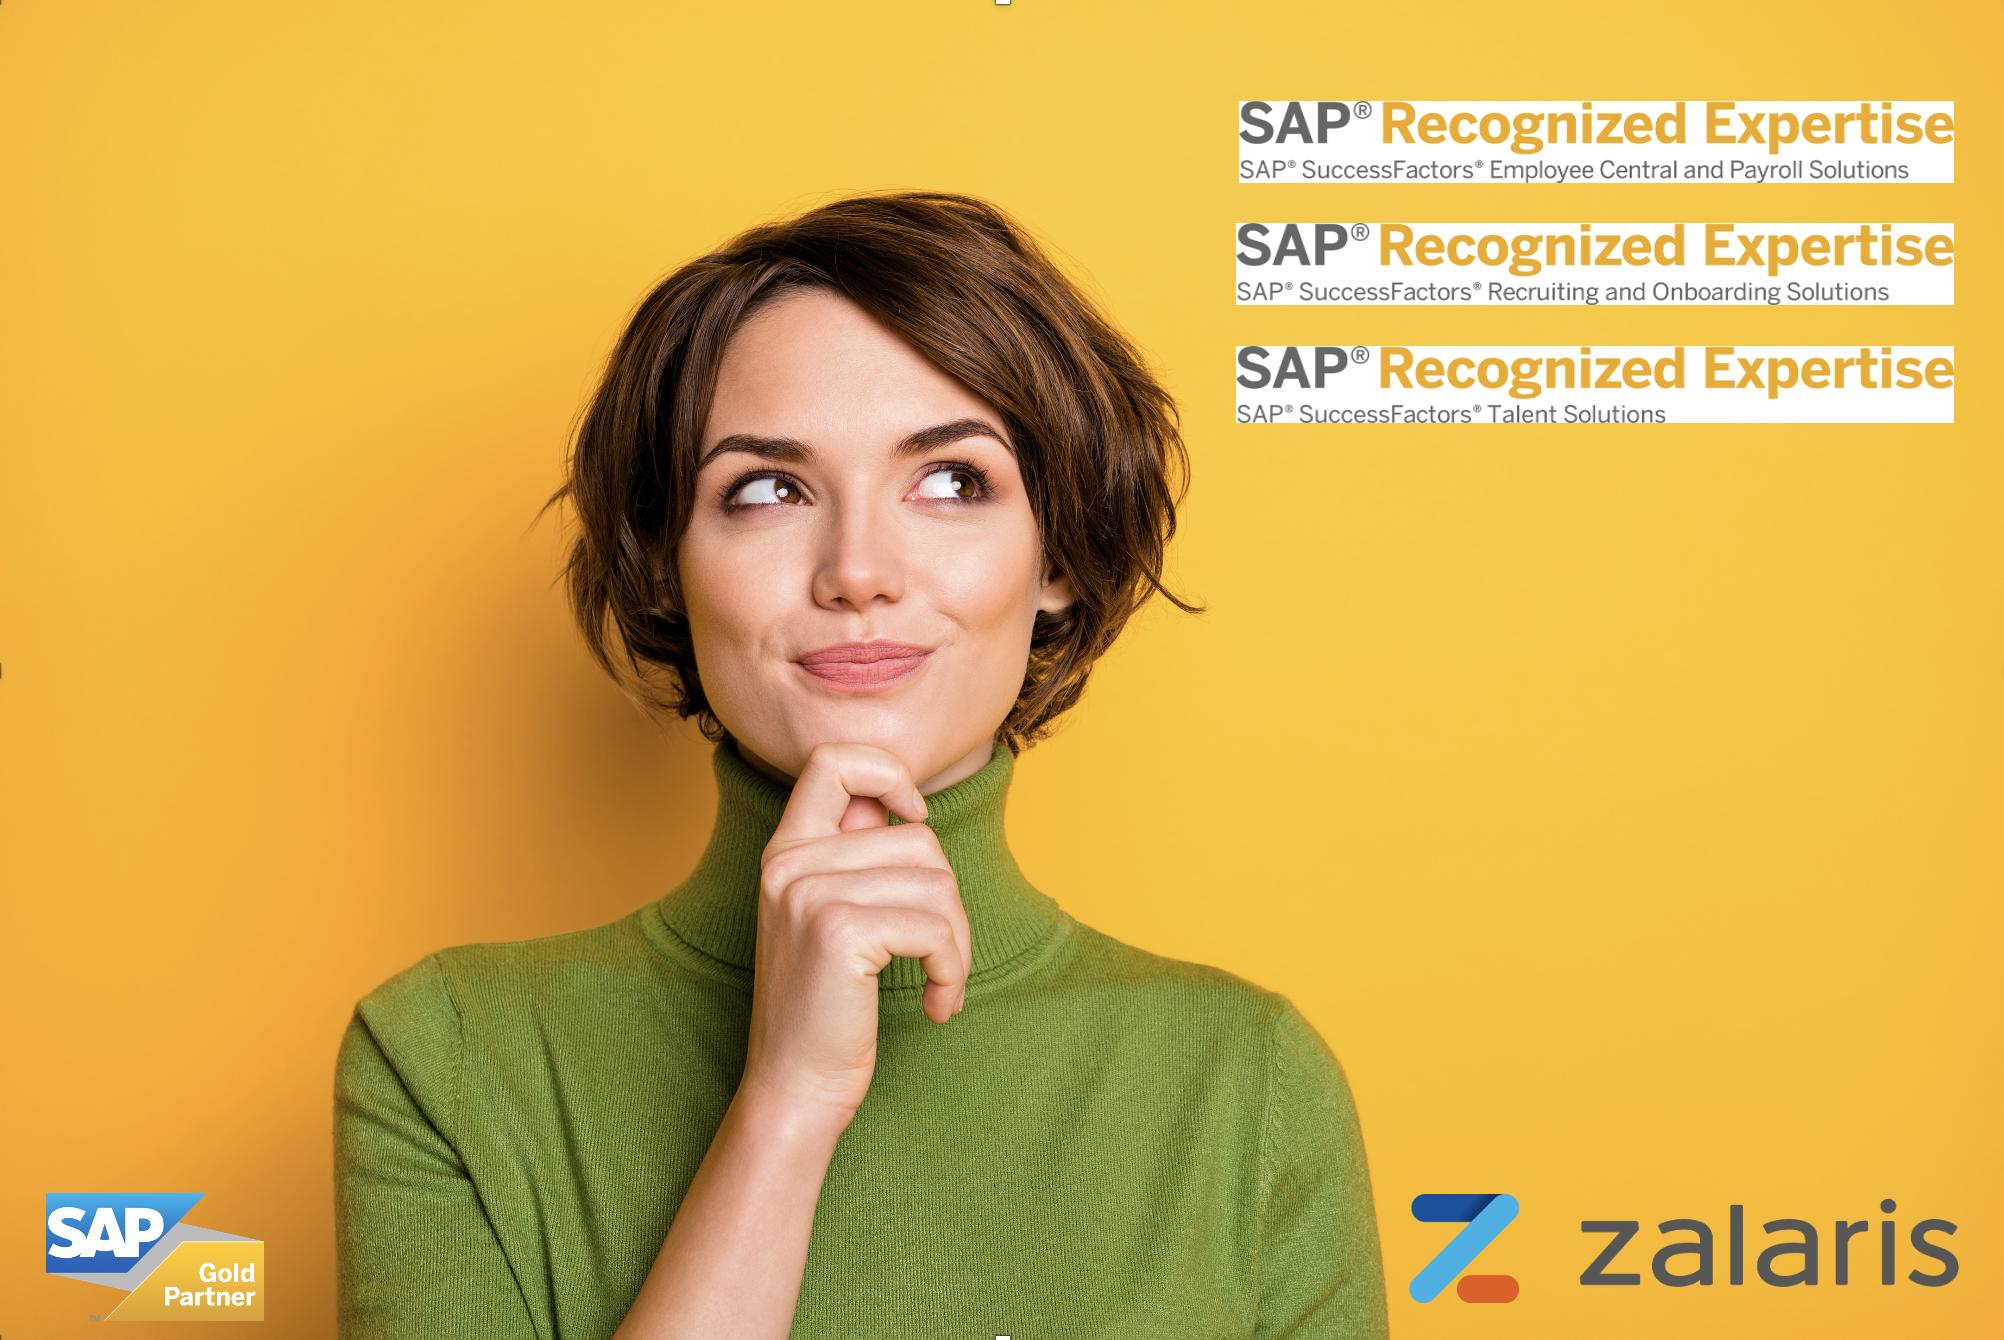 Zalaris Polska wyróżniona 3 certyfikatami SAP Recognized Expertise!